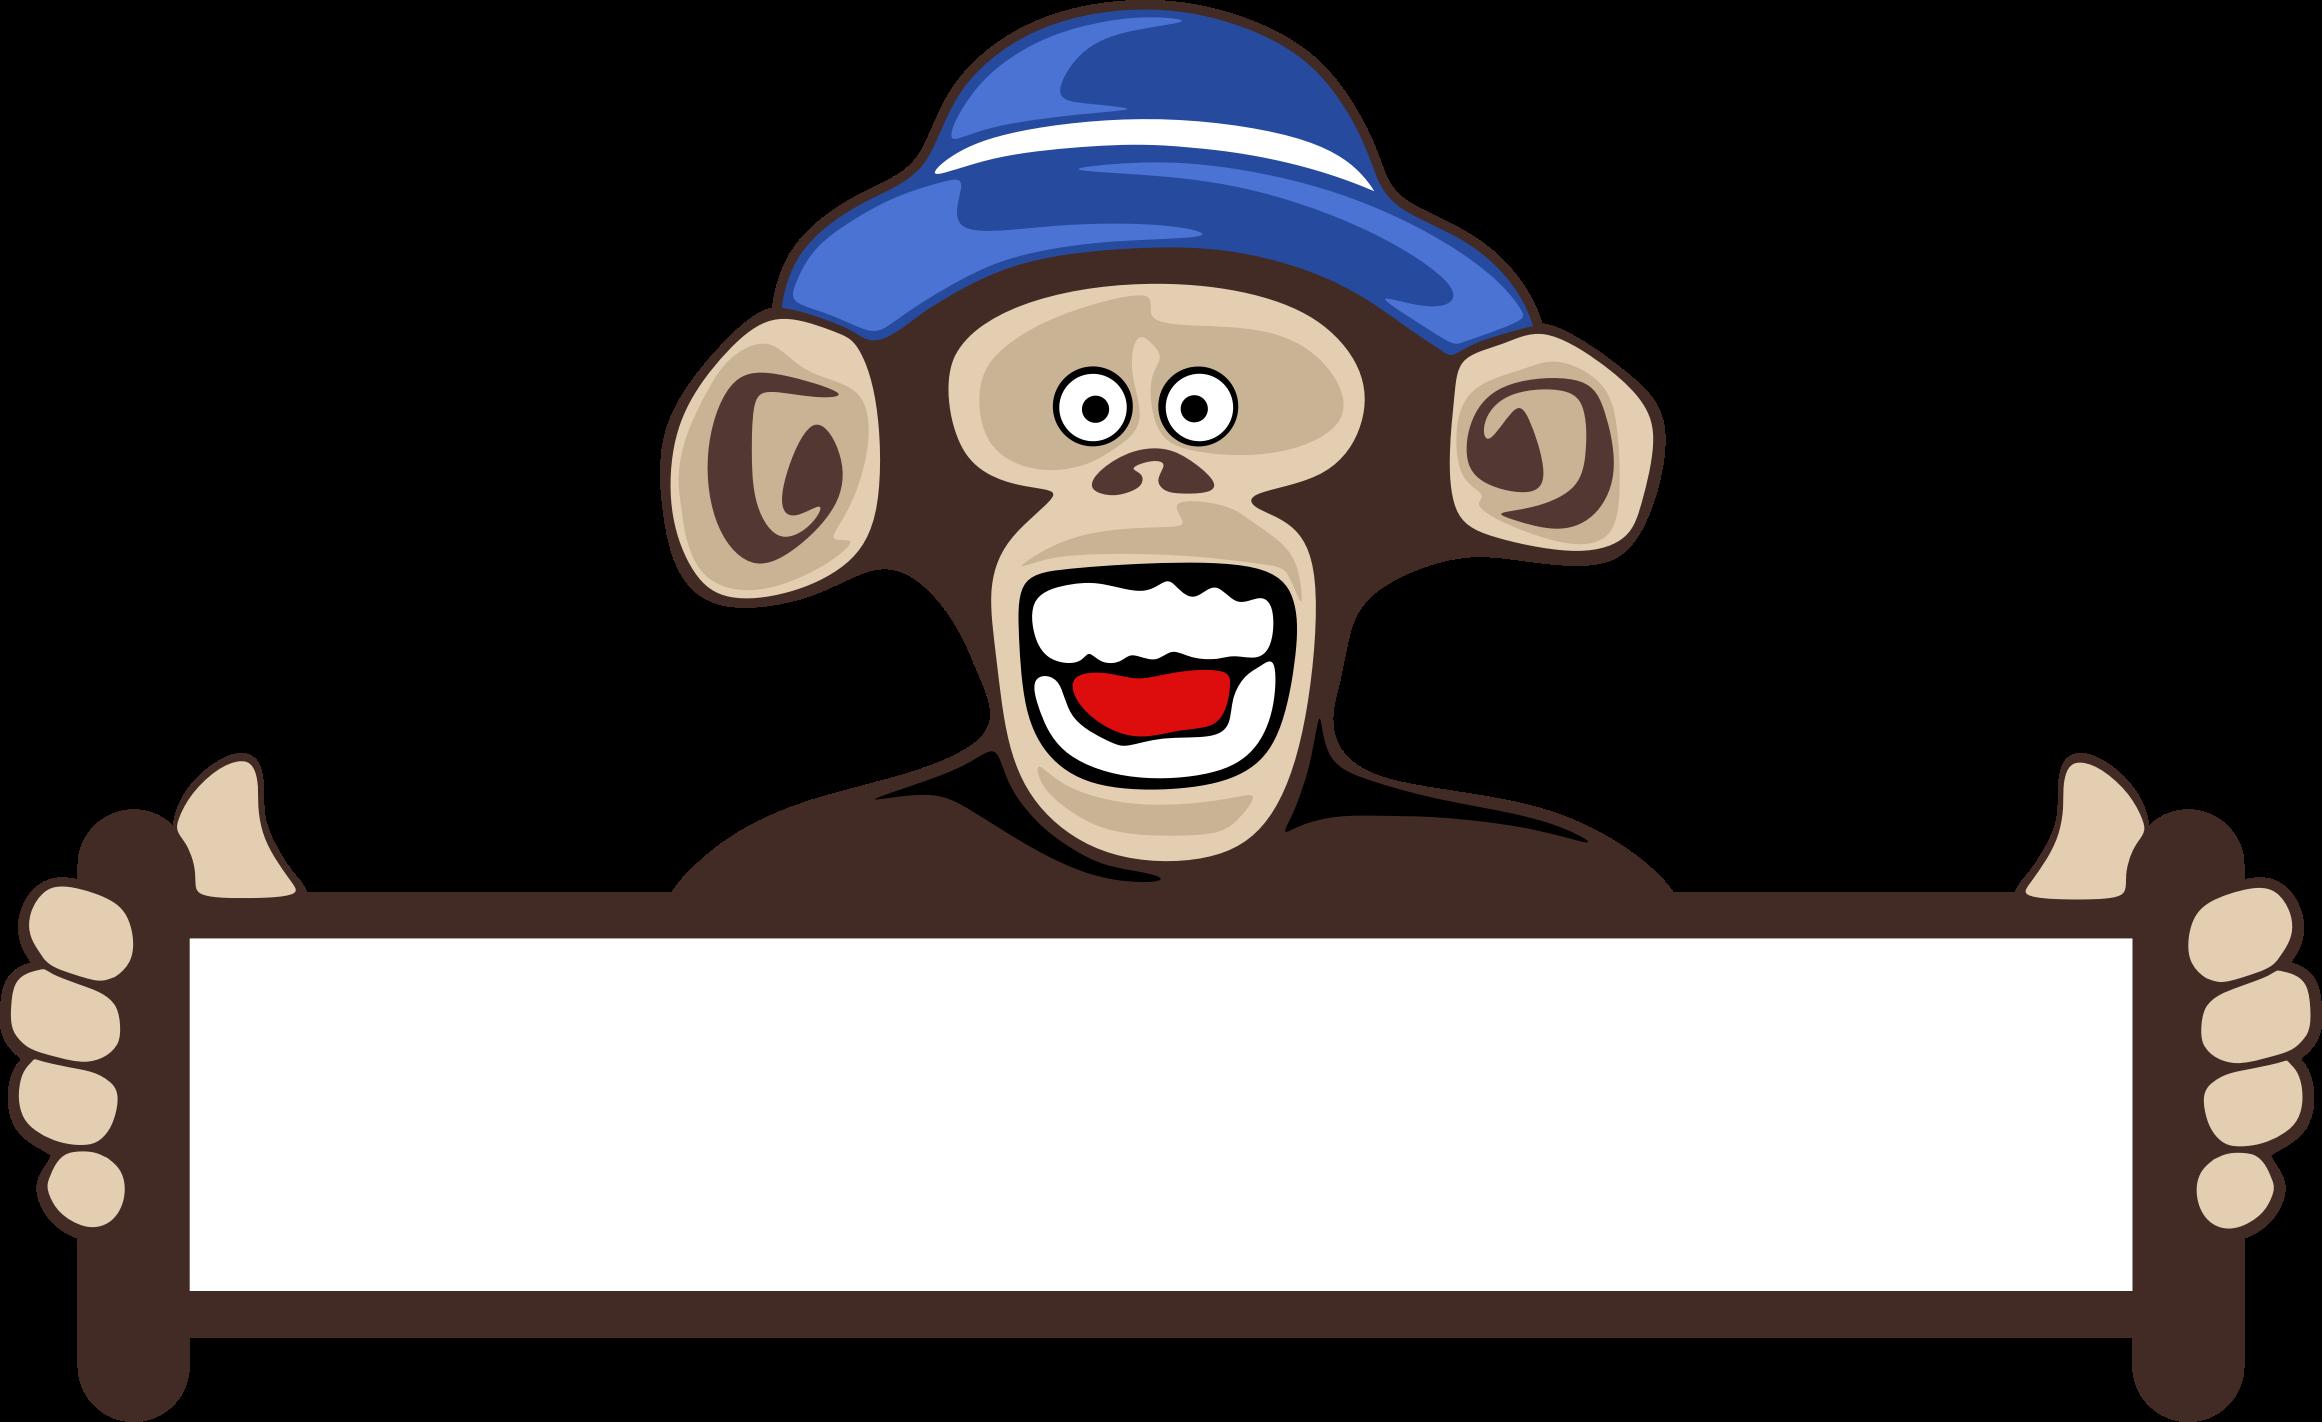 monkeys clipart sign